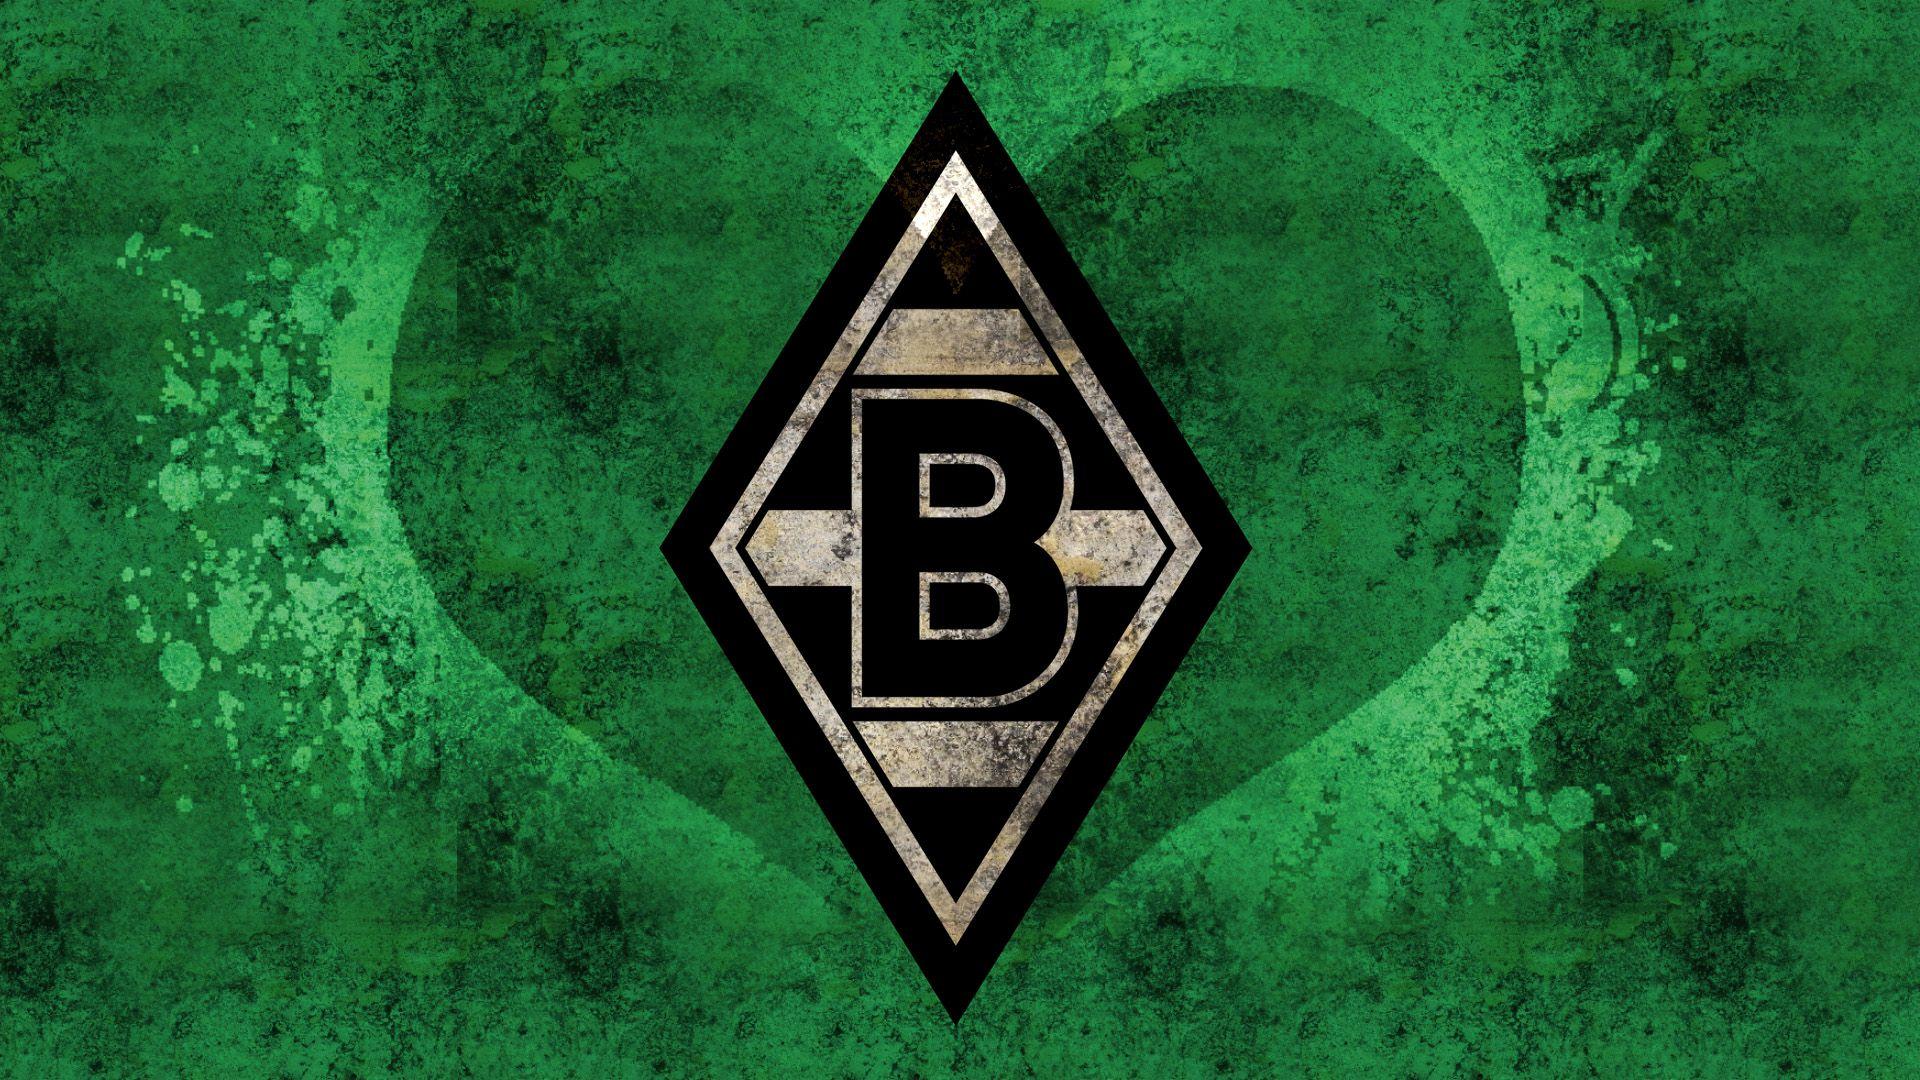 Borussia Monchengladbach004 1920x1080 Jpg 1920 1080 Borussia Monchengladbach Borussia Vfl Borussia Monchengladbach